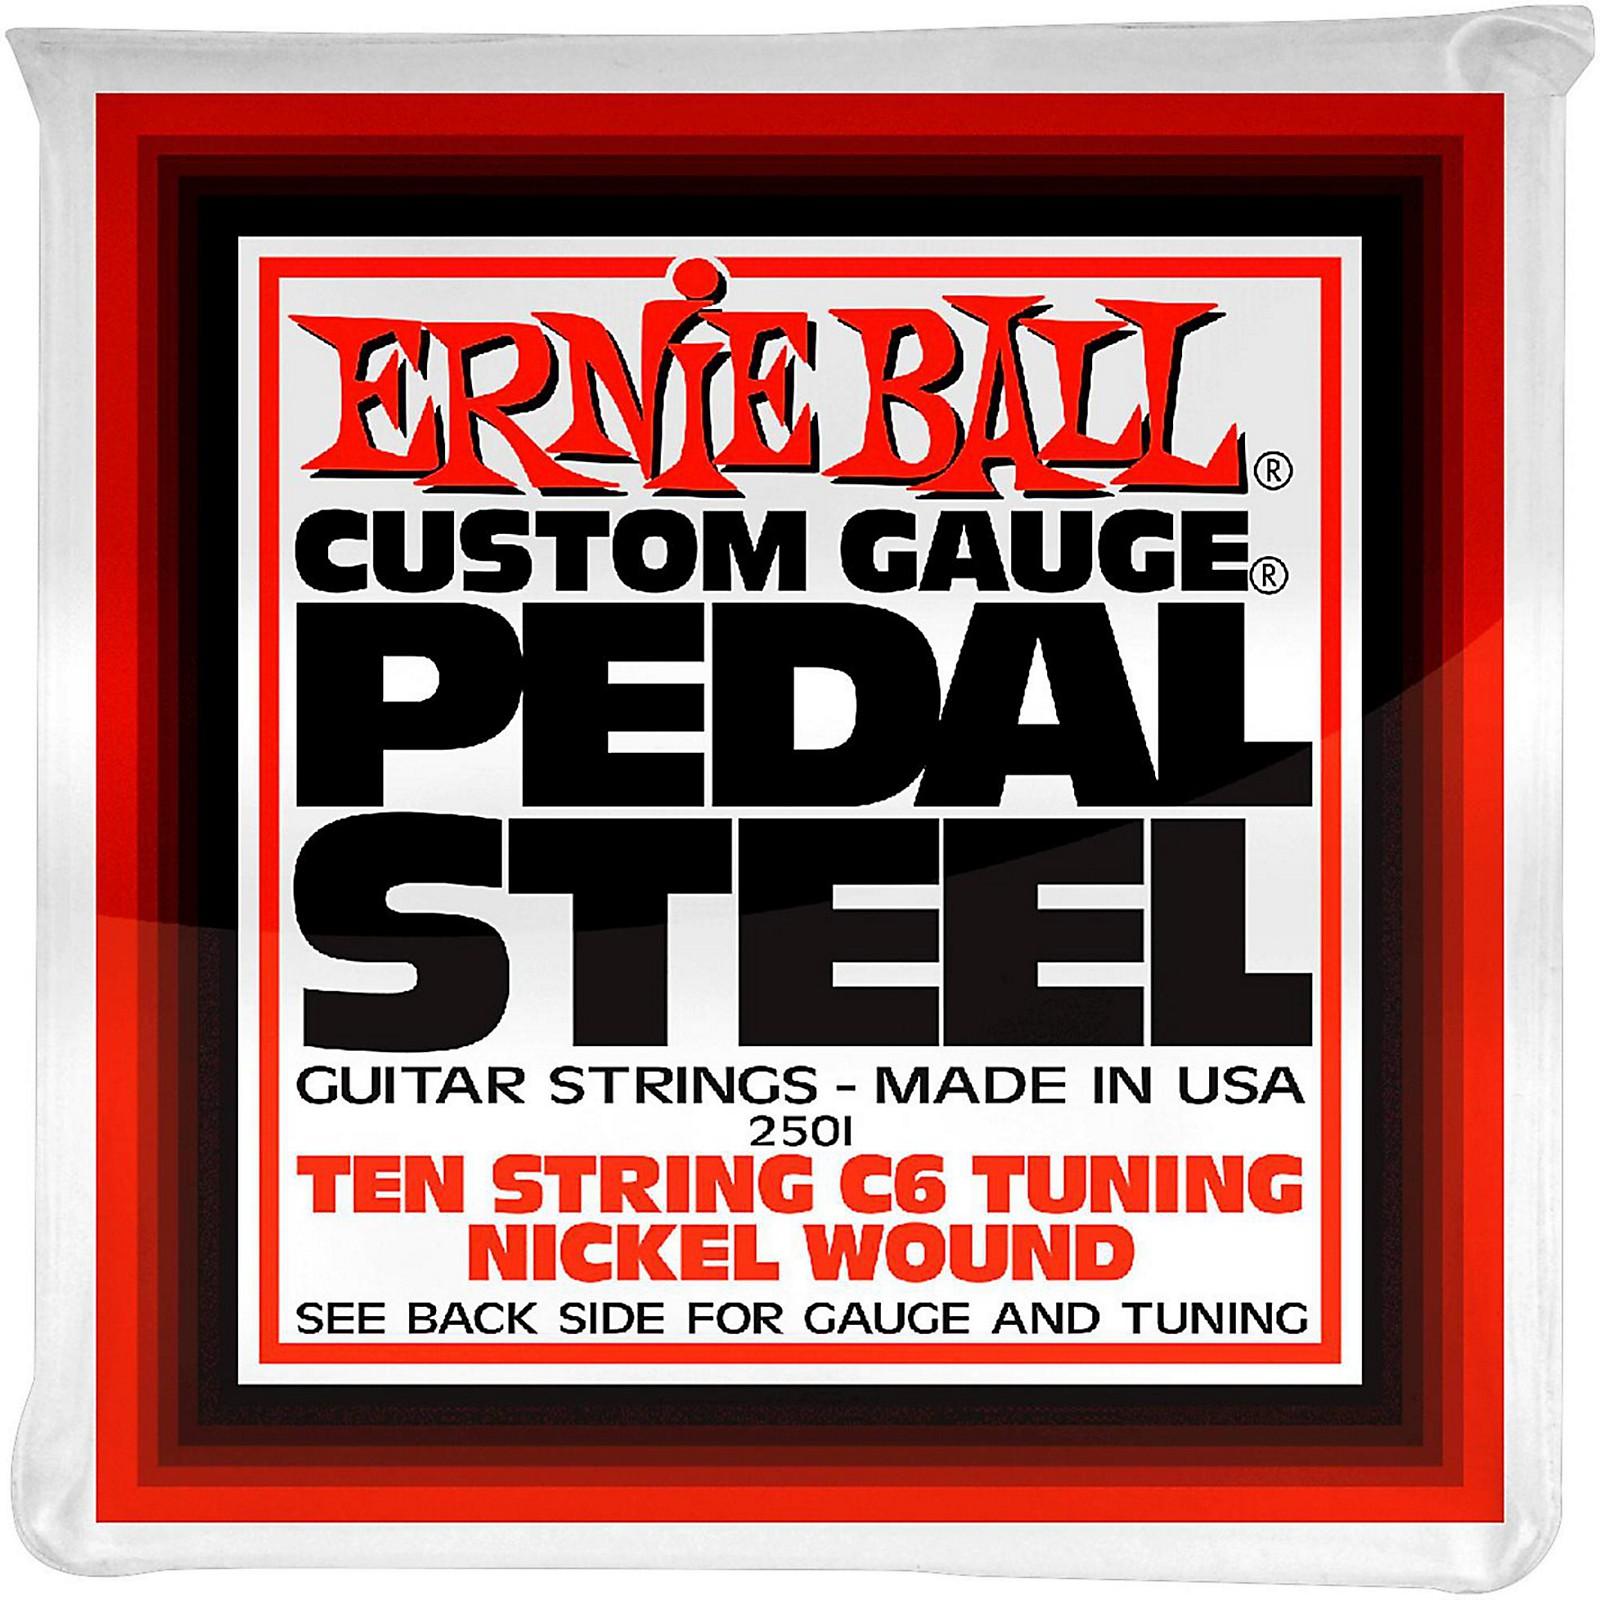 Ernie Ball 2501 10-String C6 Pedal Steel Guitar Strings